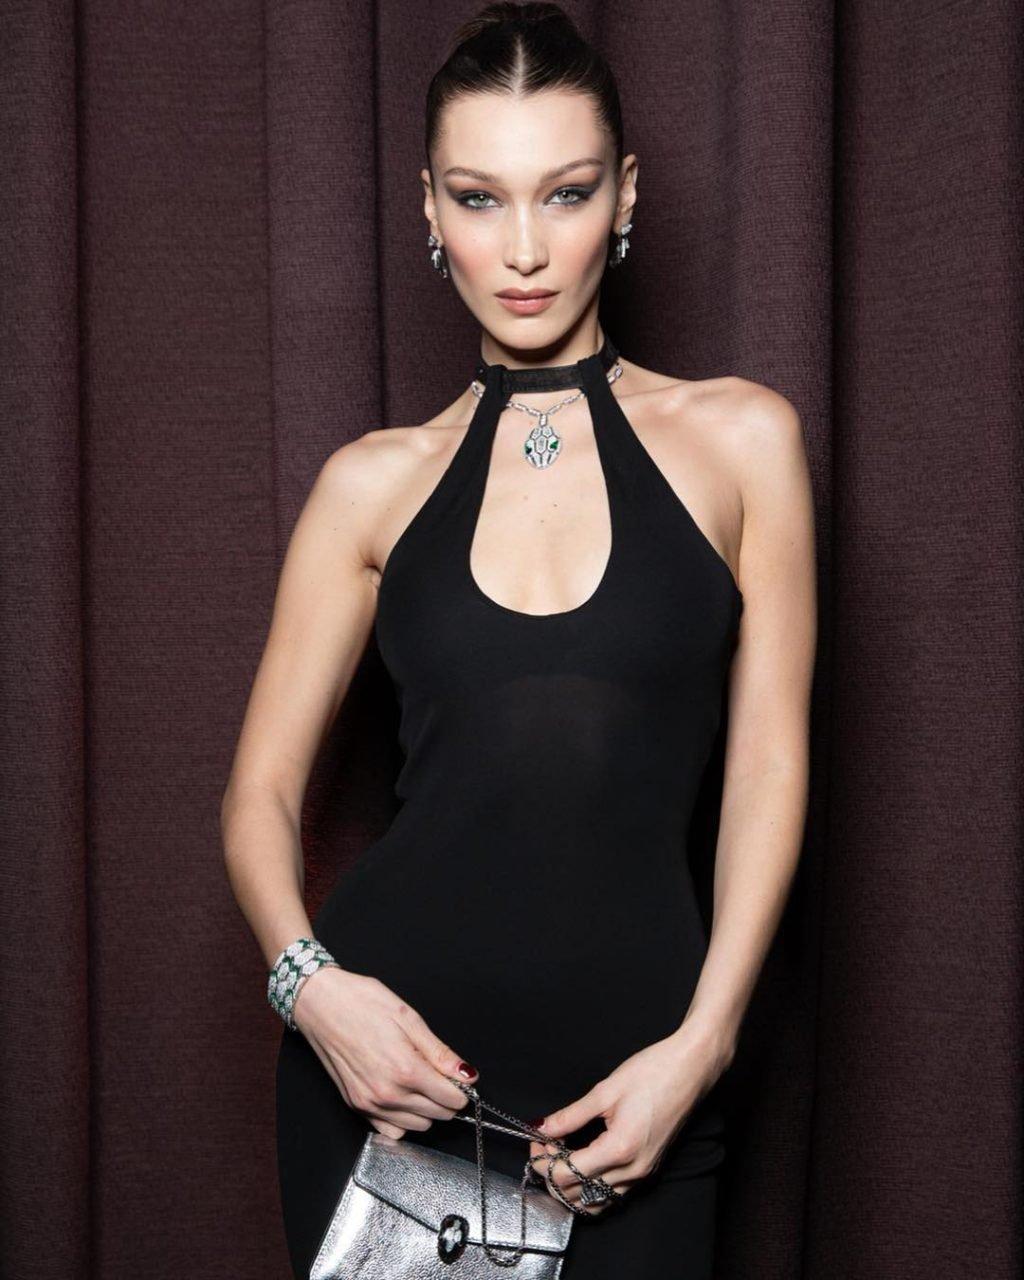 Vogue italy,Sabine jemeljanova swimsuit Porn picture Ilfenesh hadera,Mtv movie awards results